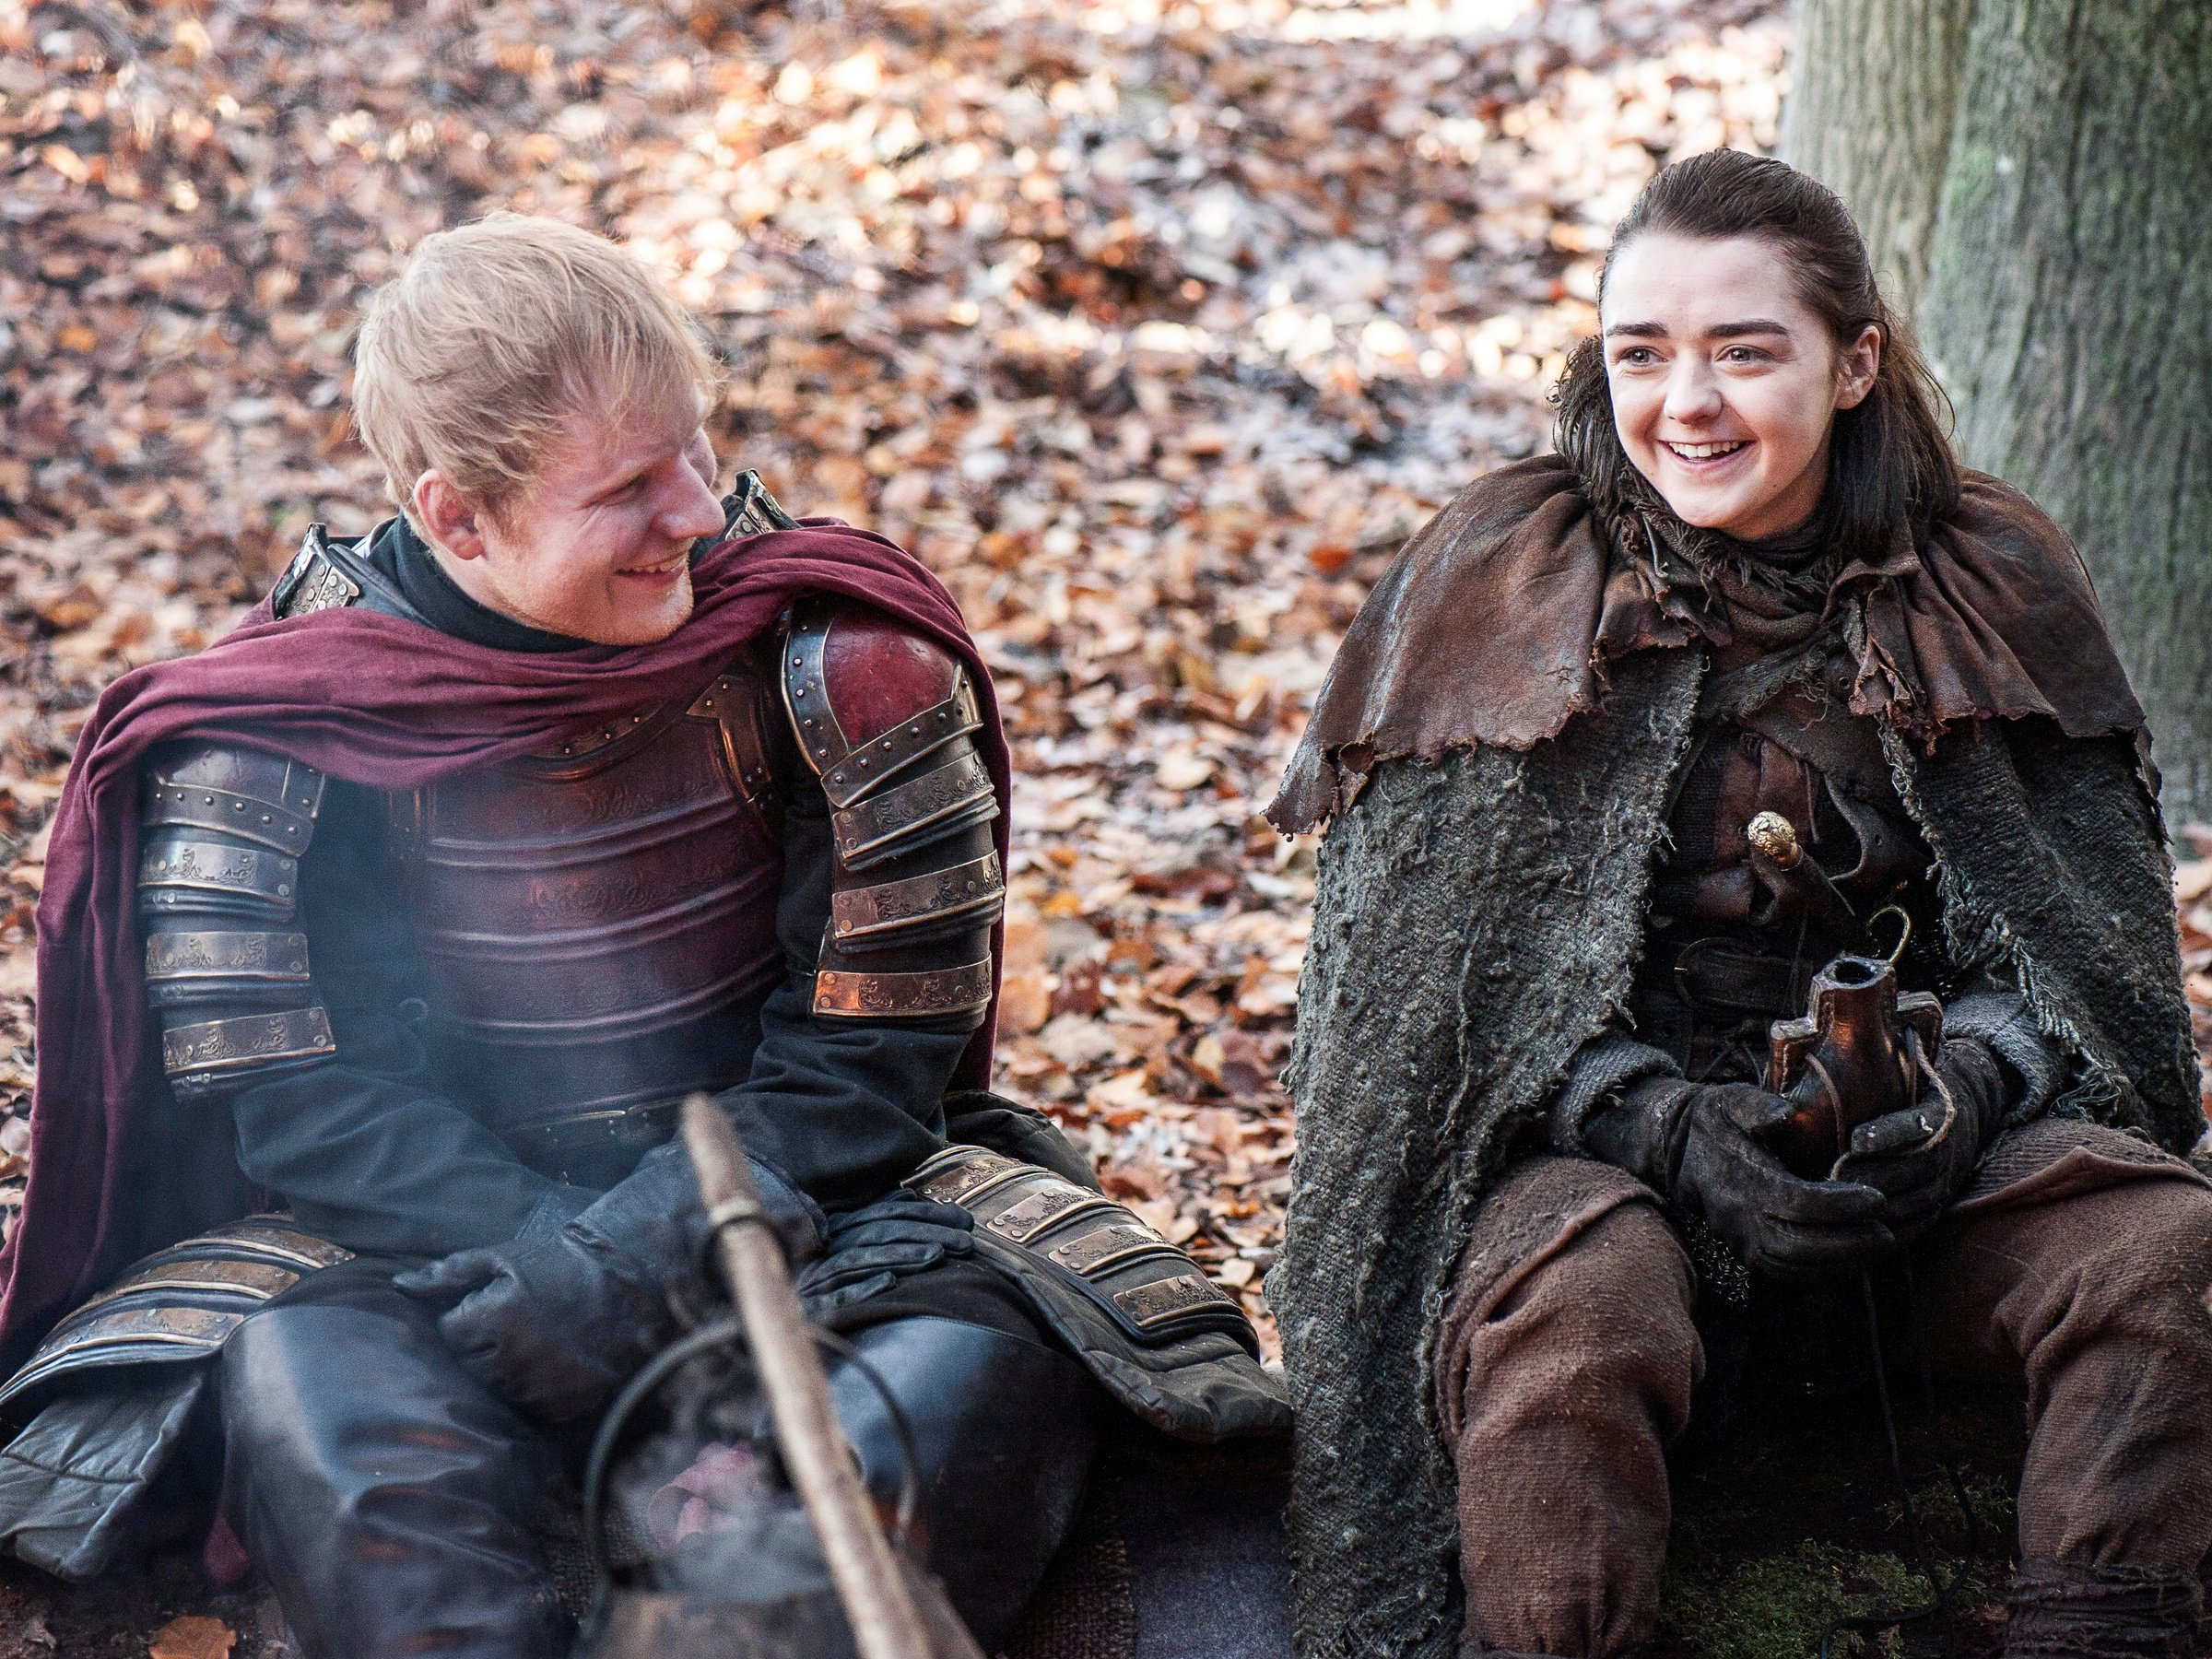 ed_sheeran_and_arya_stark_game_of_thrones.jpg